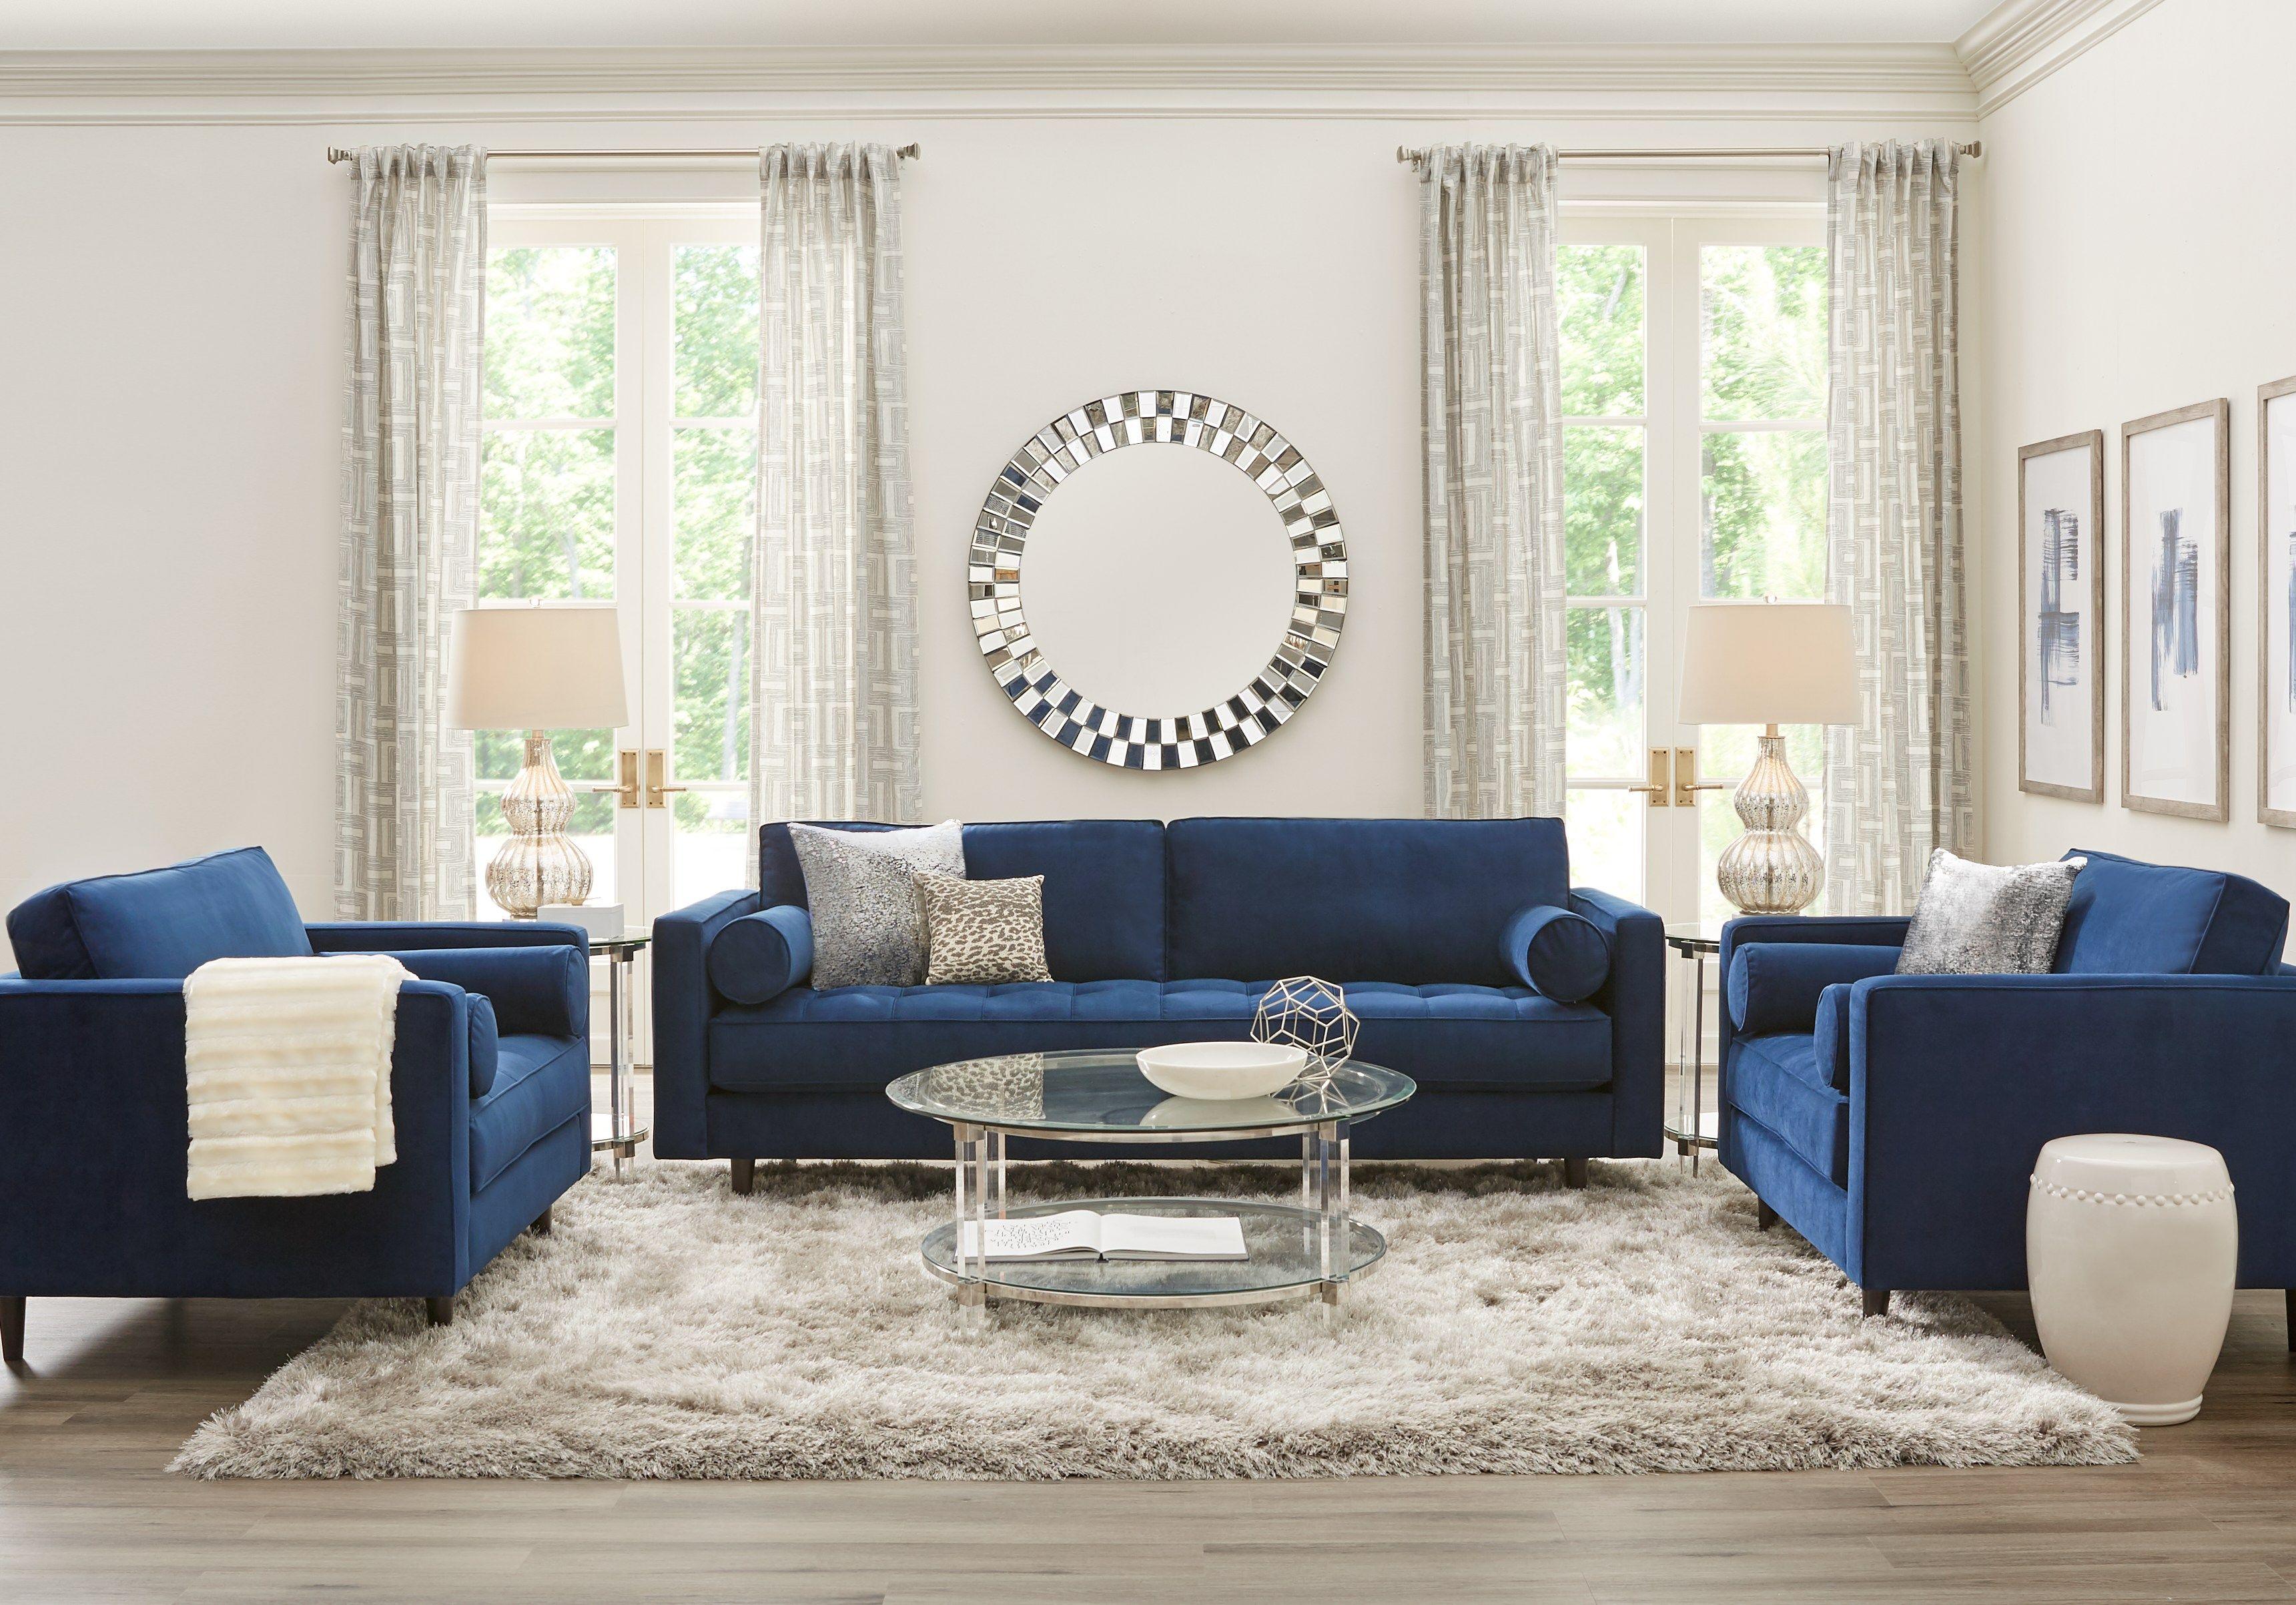 Sofia Vergara Pacific Palisades Navy Plush 7 Pc Living Room Living Room Sets Furniture Living Room Sets Blue Living Room Sets